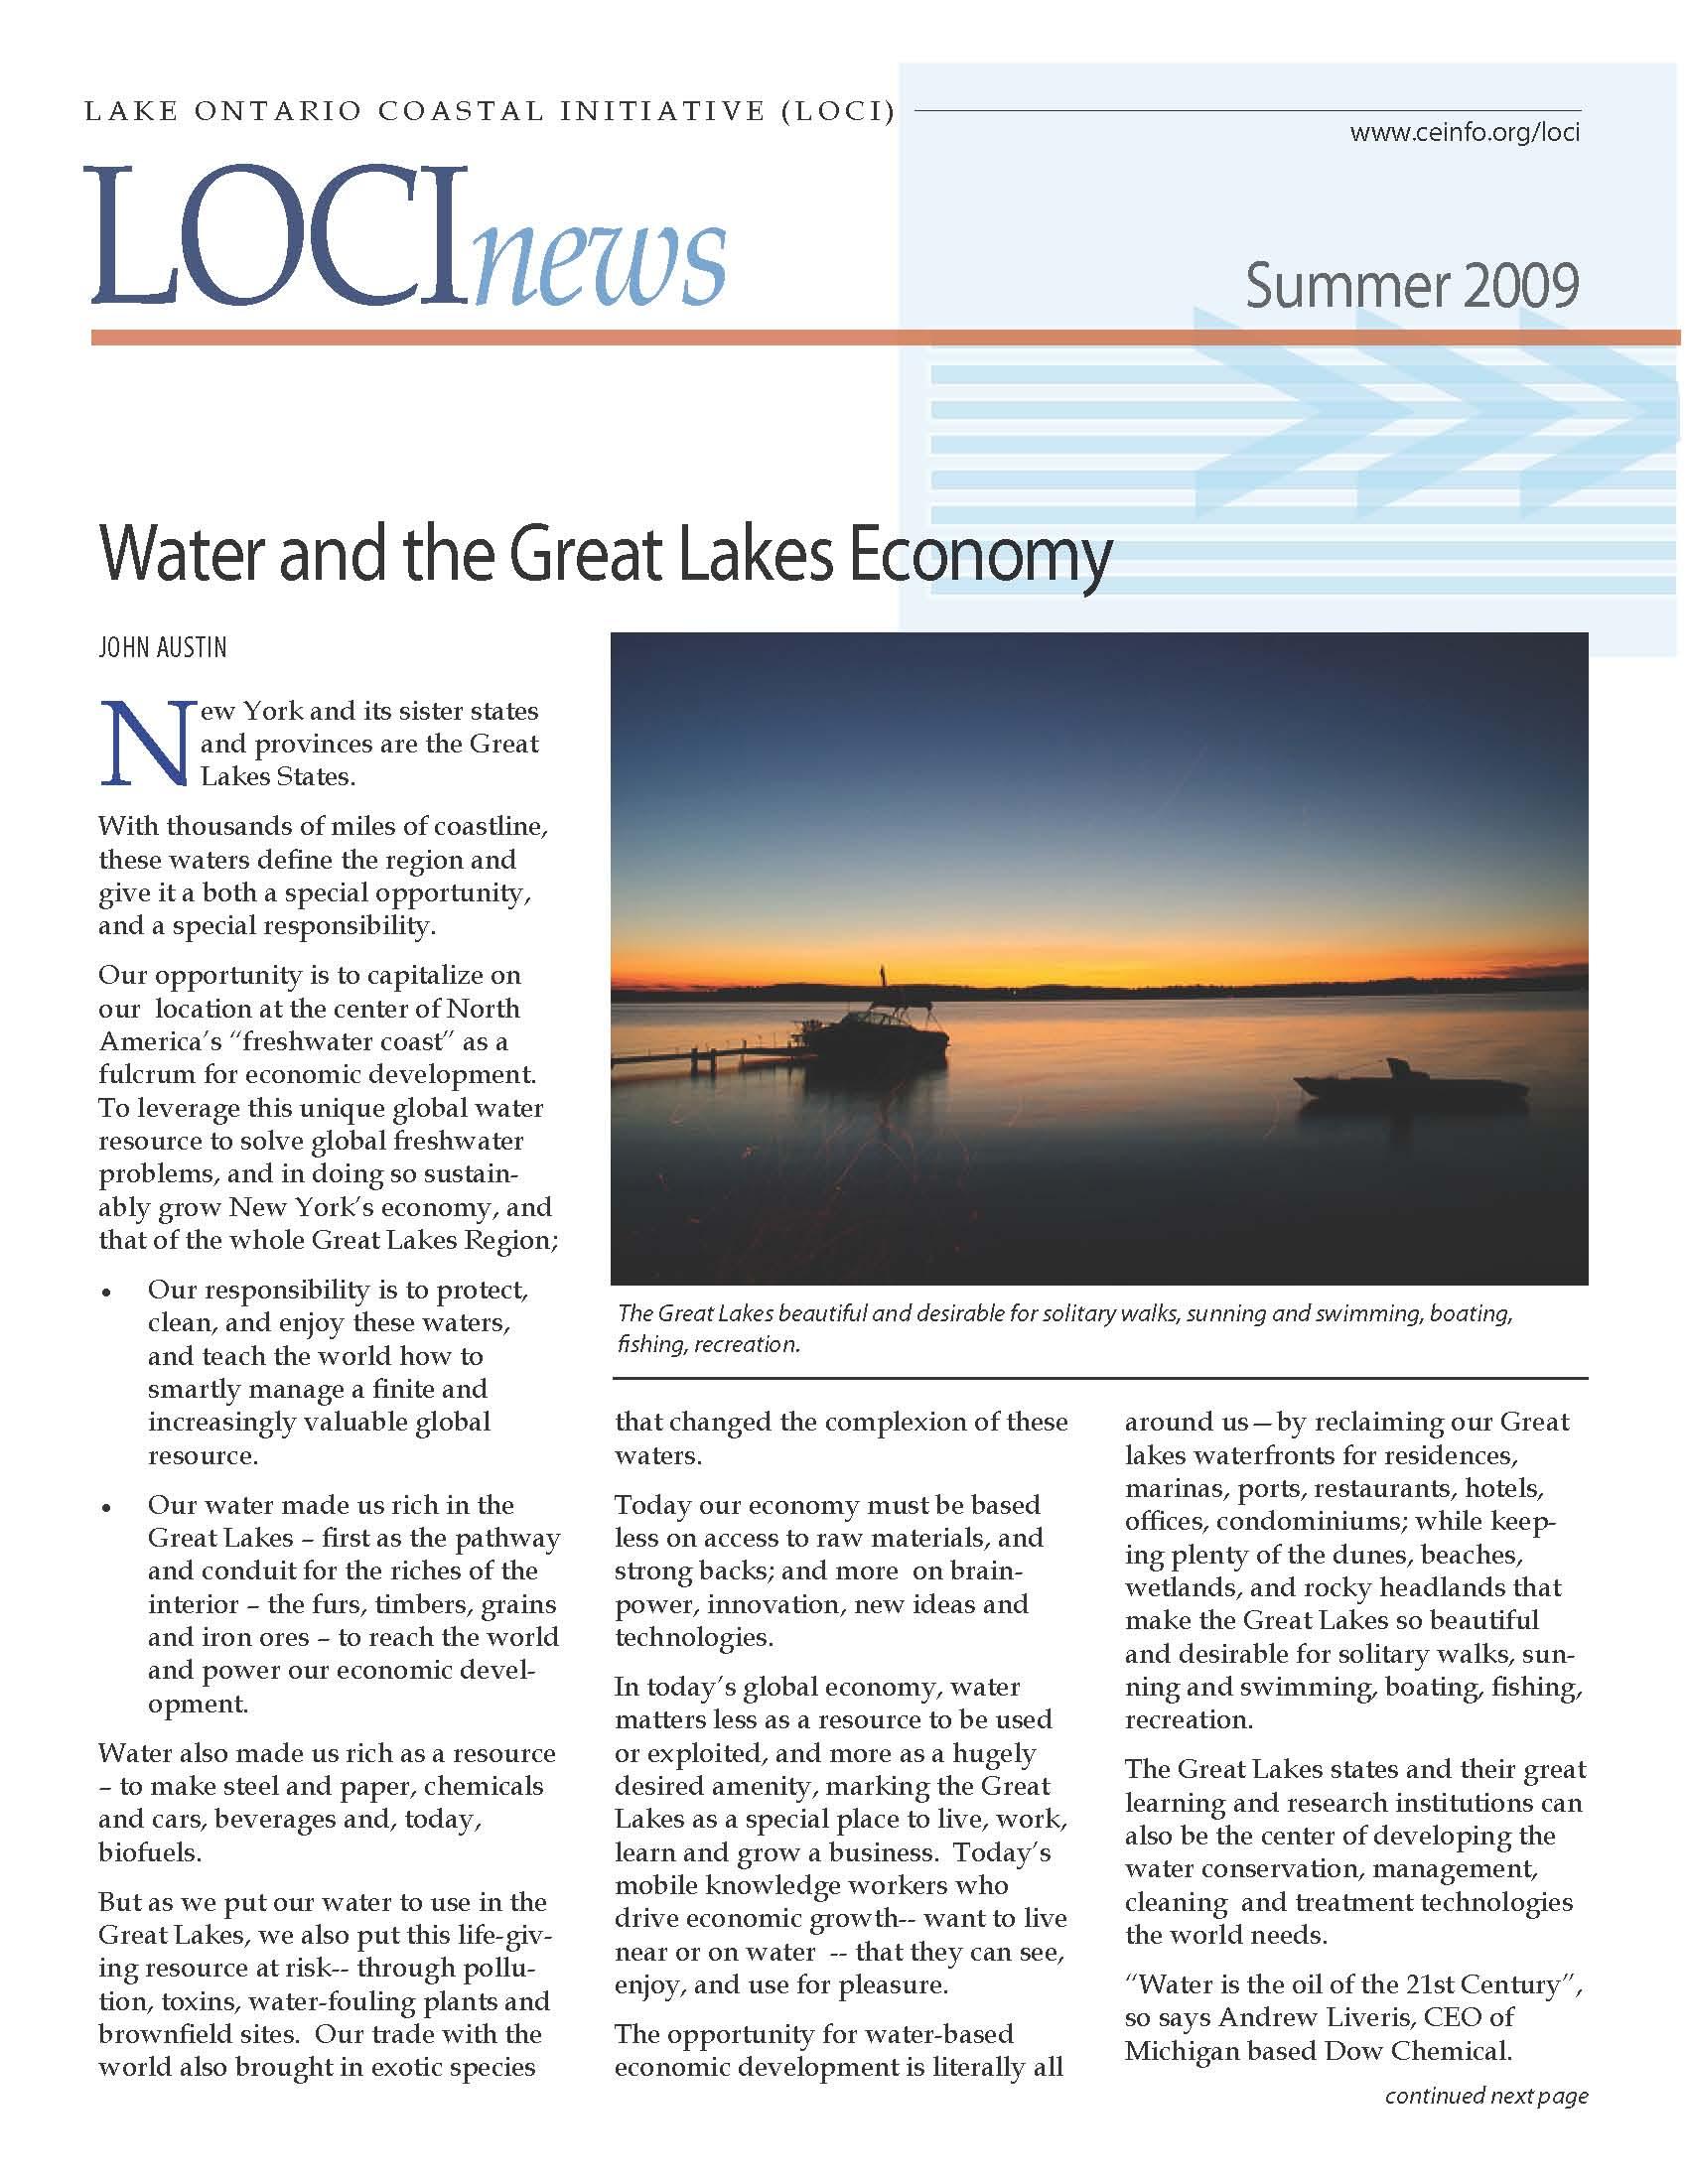 LOCI Newsletter Front.jpg